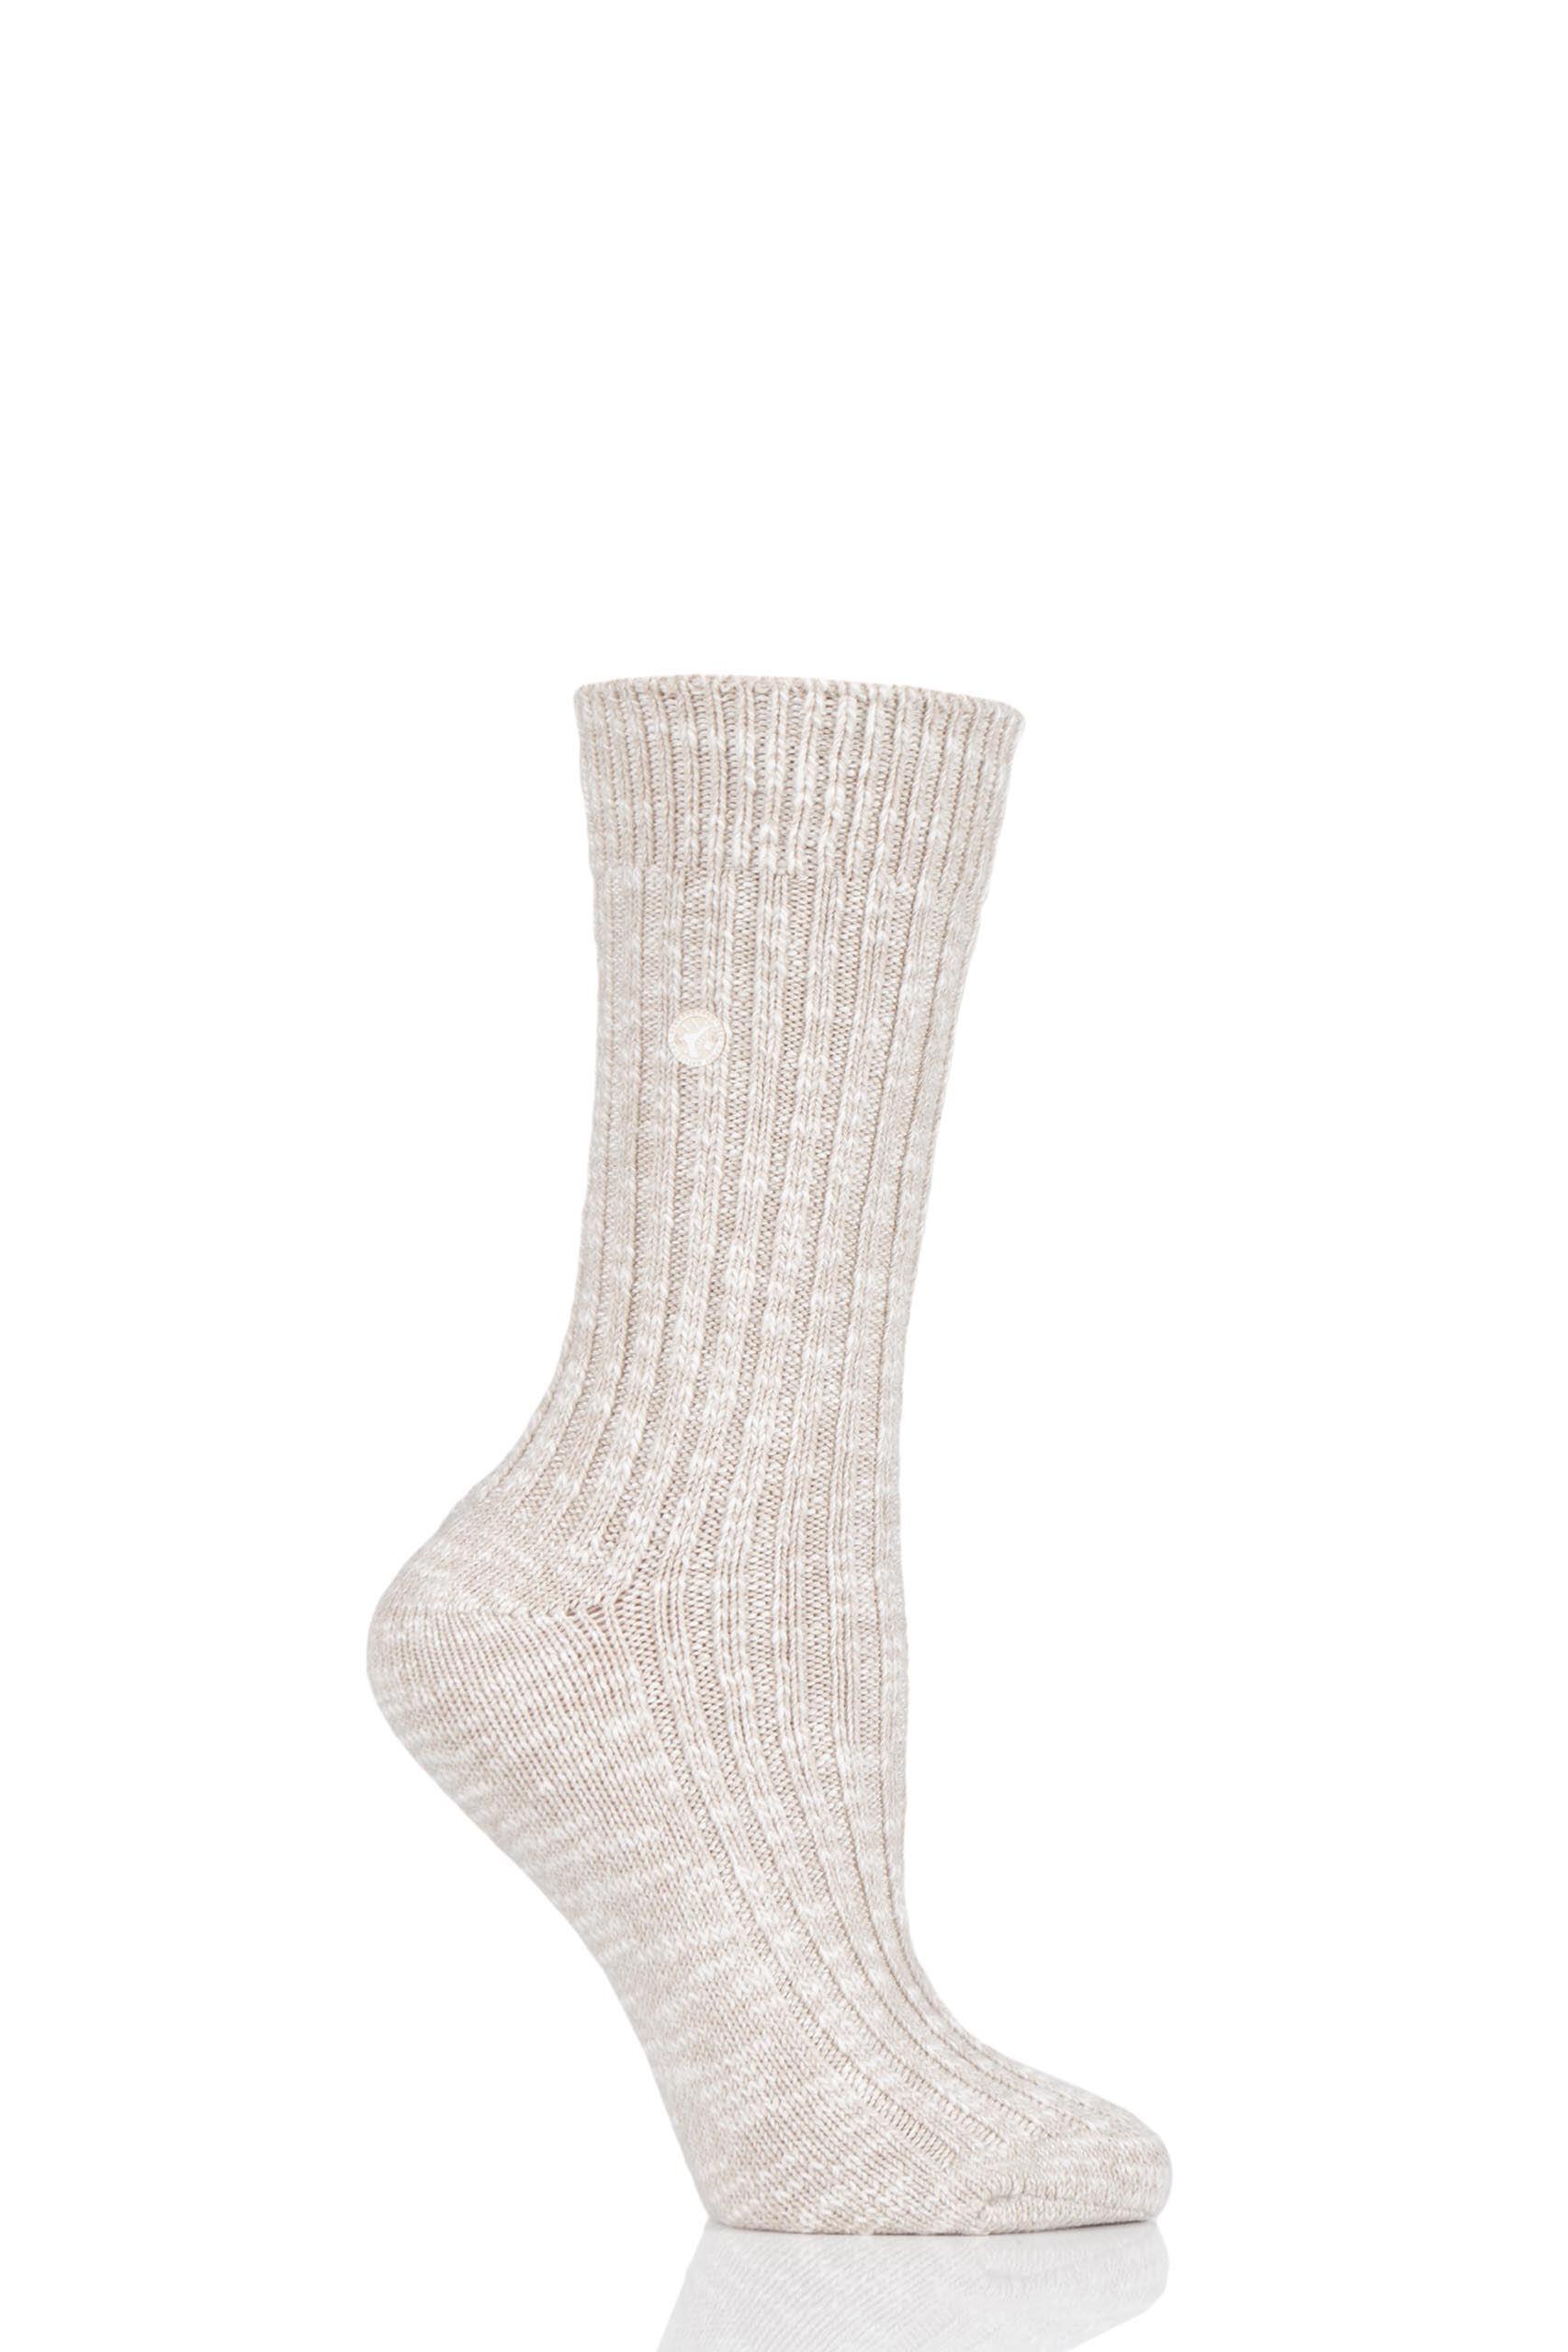 Image of 1 Pair Beige Cotton Slub Chunky Ribbed Socks Ladies 3.5-5 Ladies - Birkenstock